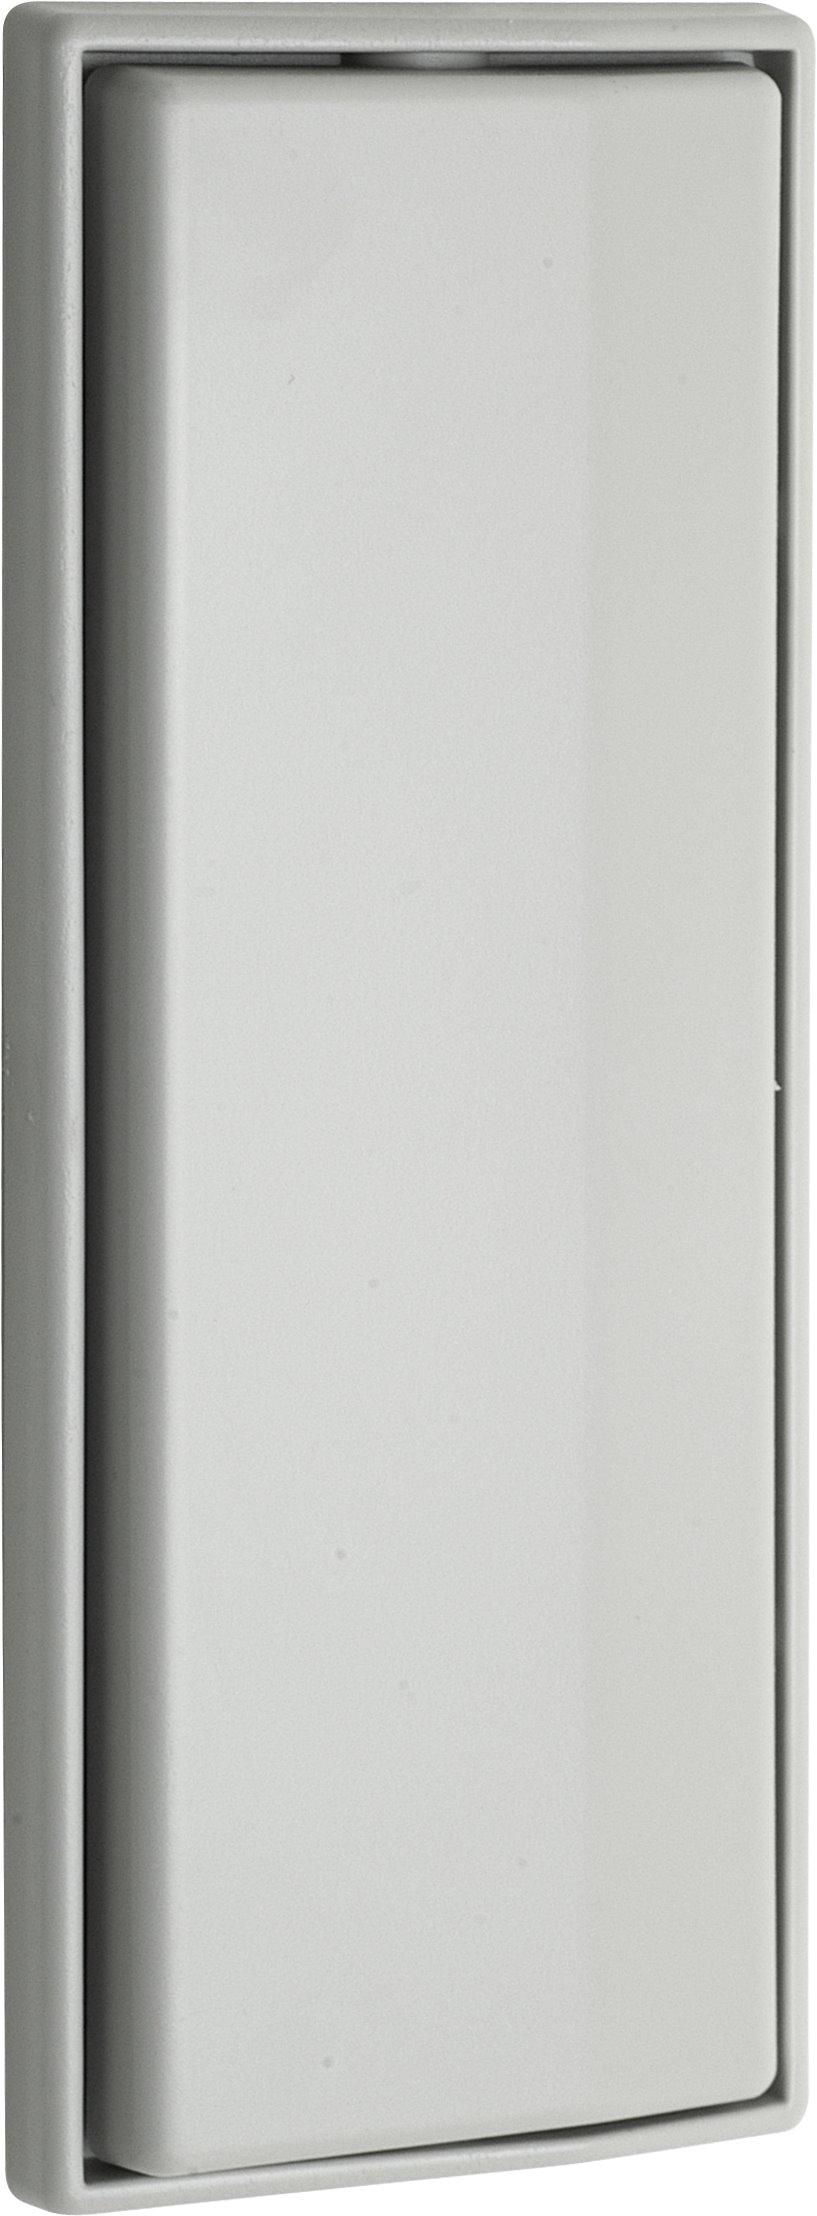 DA8550